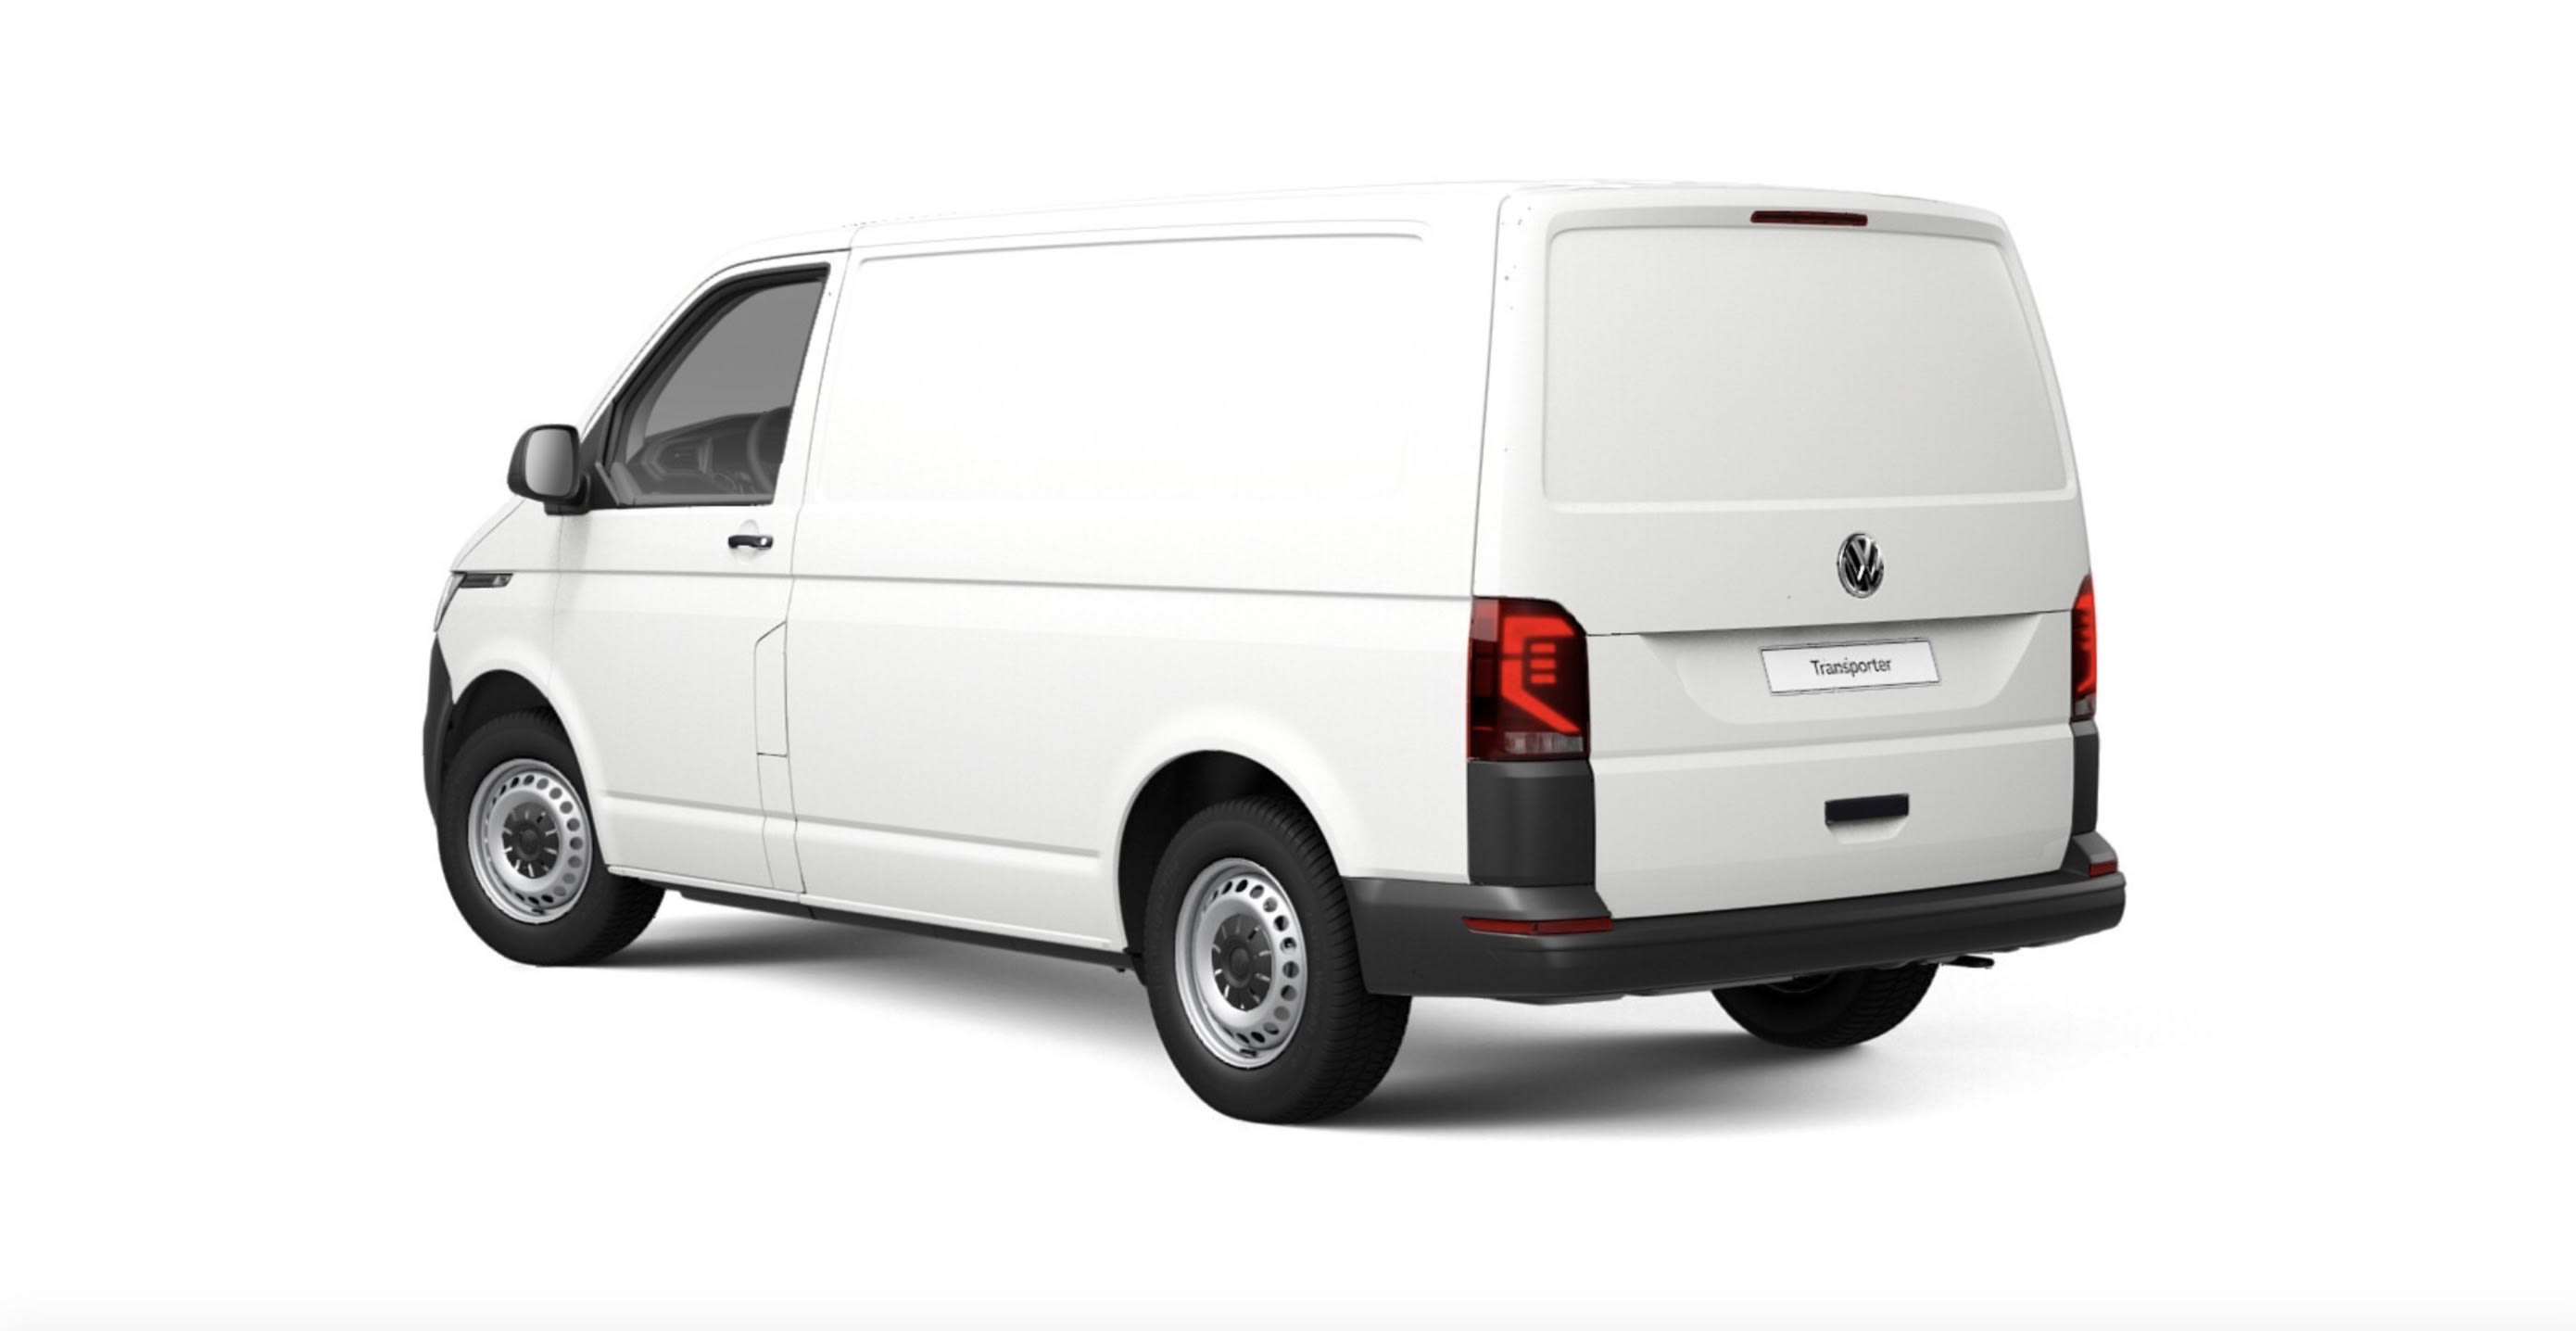 2021 Volkswagen Transporter 6 1 Price And Specs Transporter Caravelle Multivan Caradvice